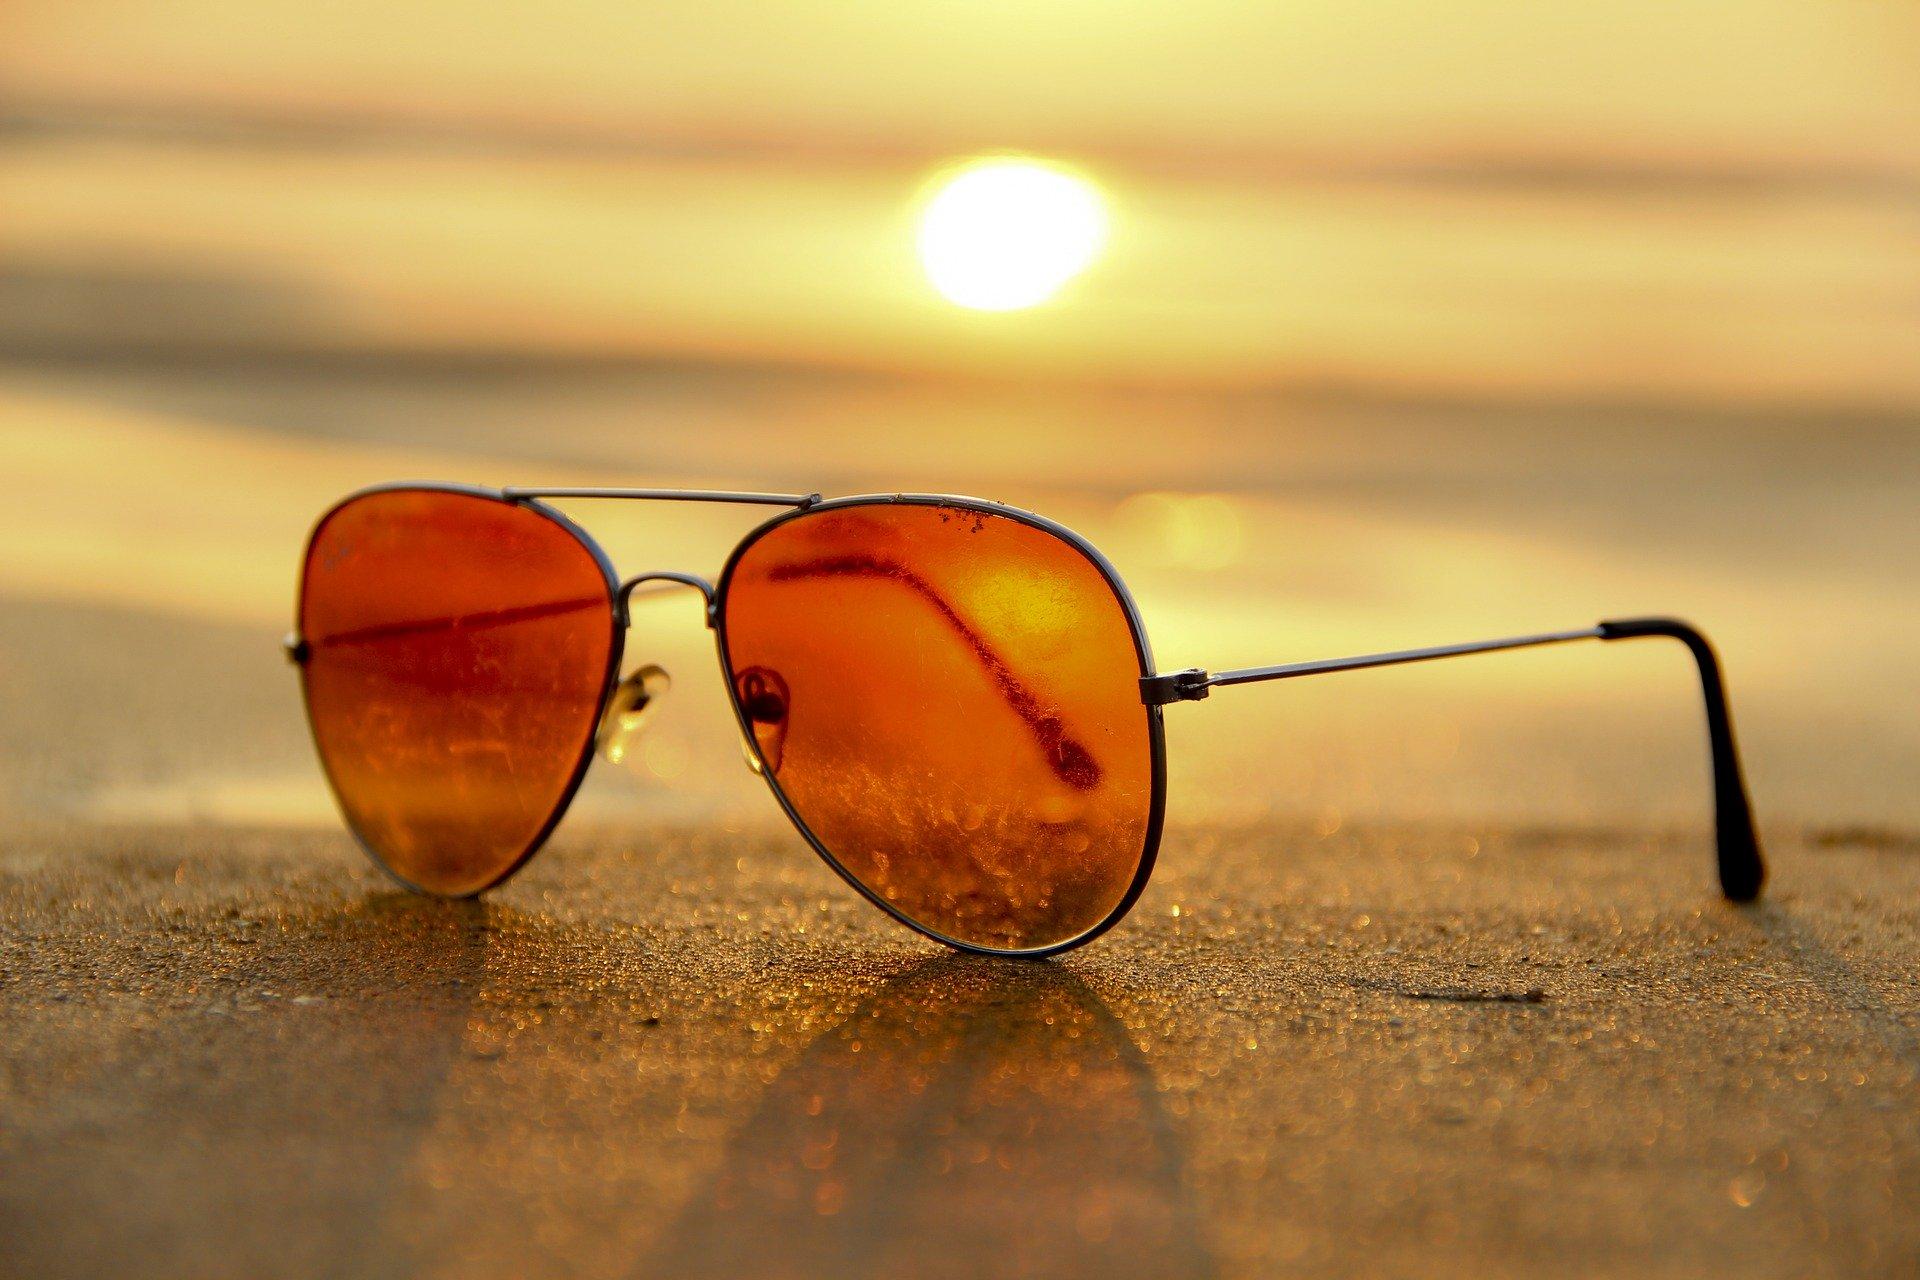 Sunglass Holder For Car Visor Clip